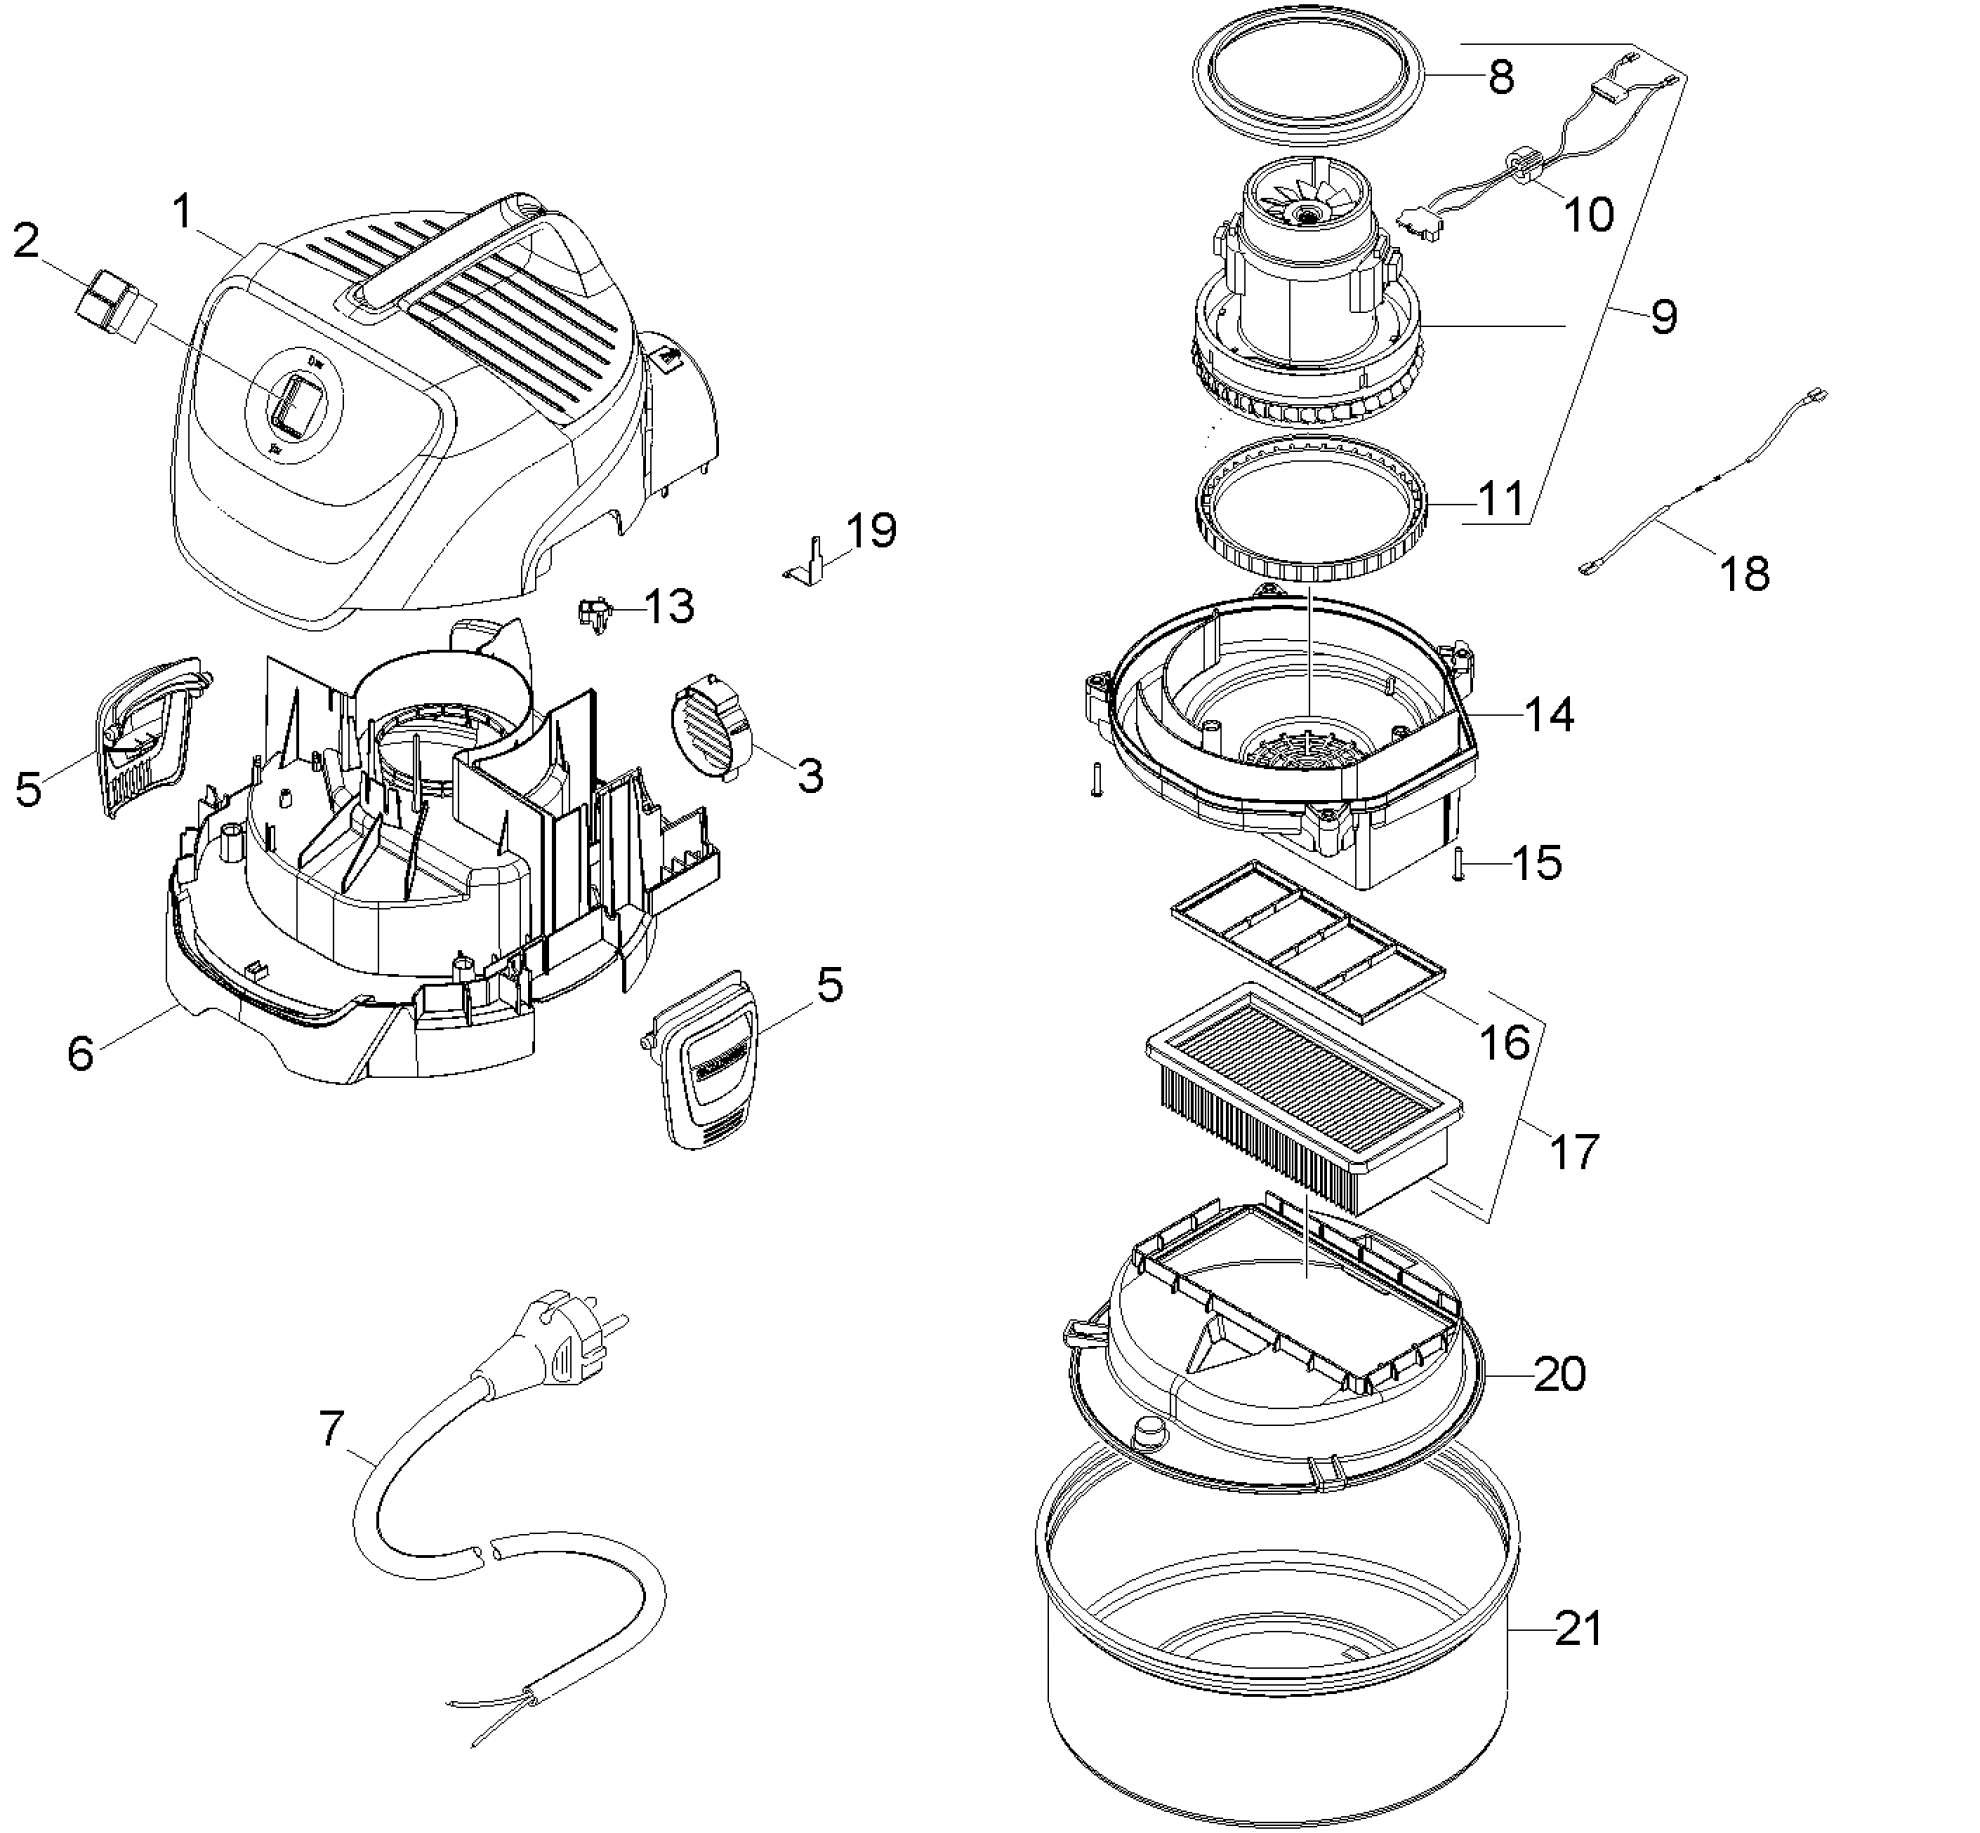 pi ces d tach es aspirateur karcher fireplace vac ad eu ii. Black Bedroom Furniture Sets. Home Design Ideas